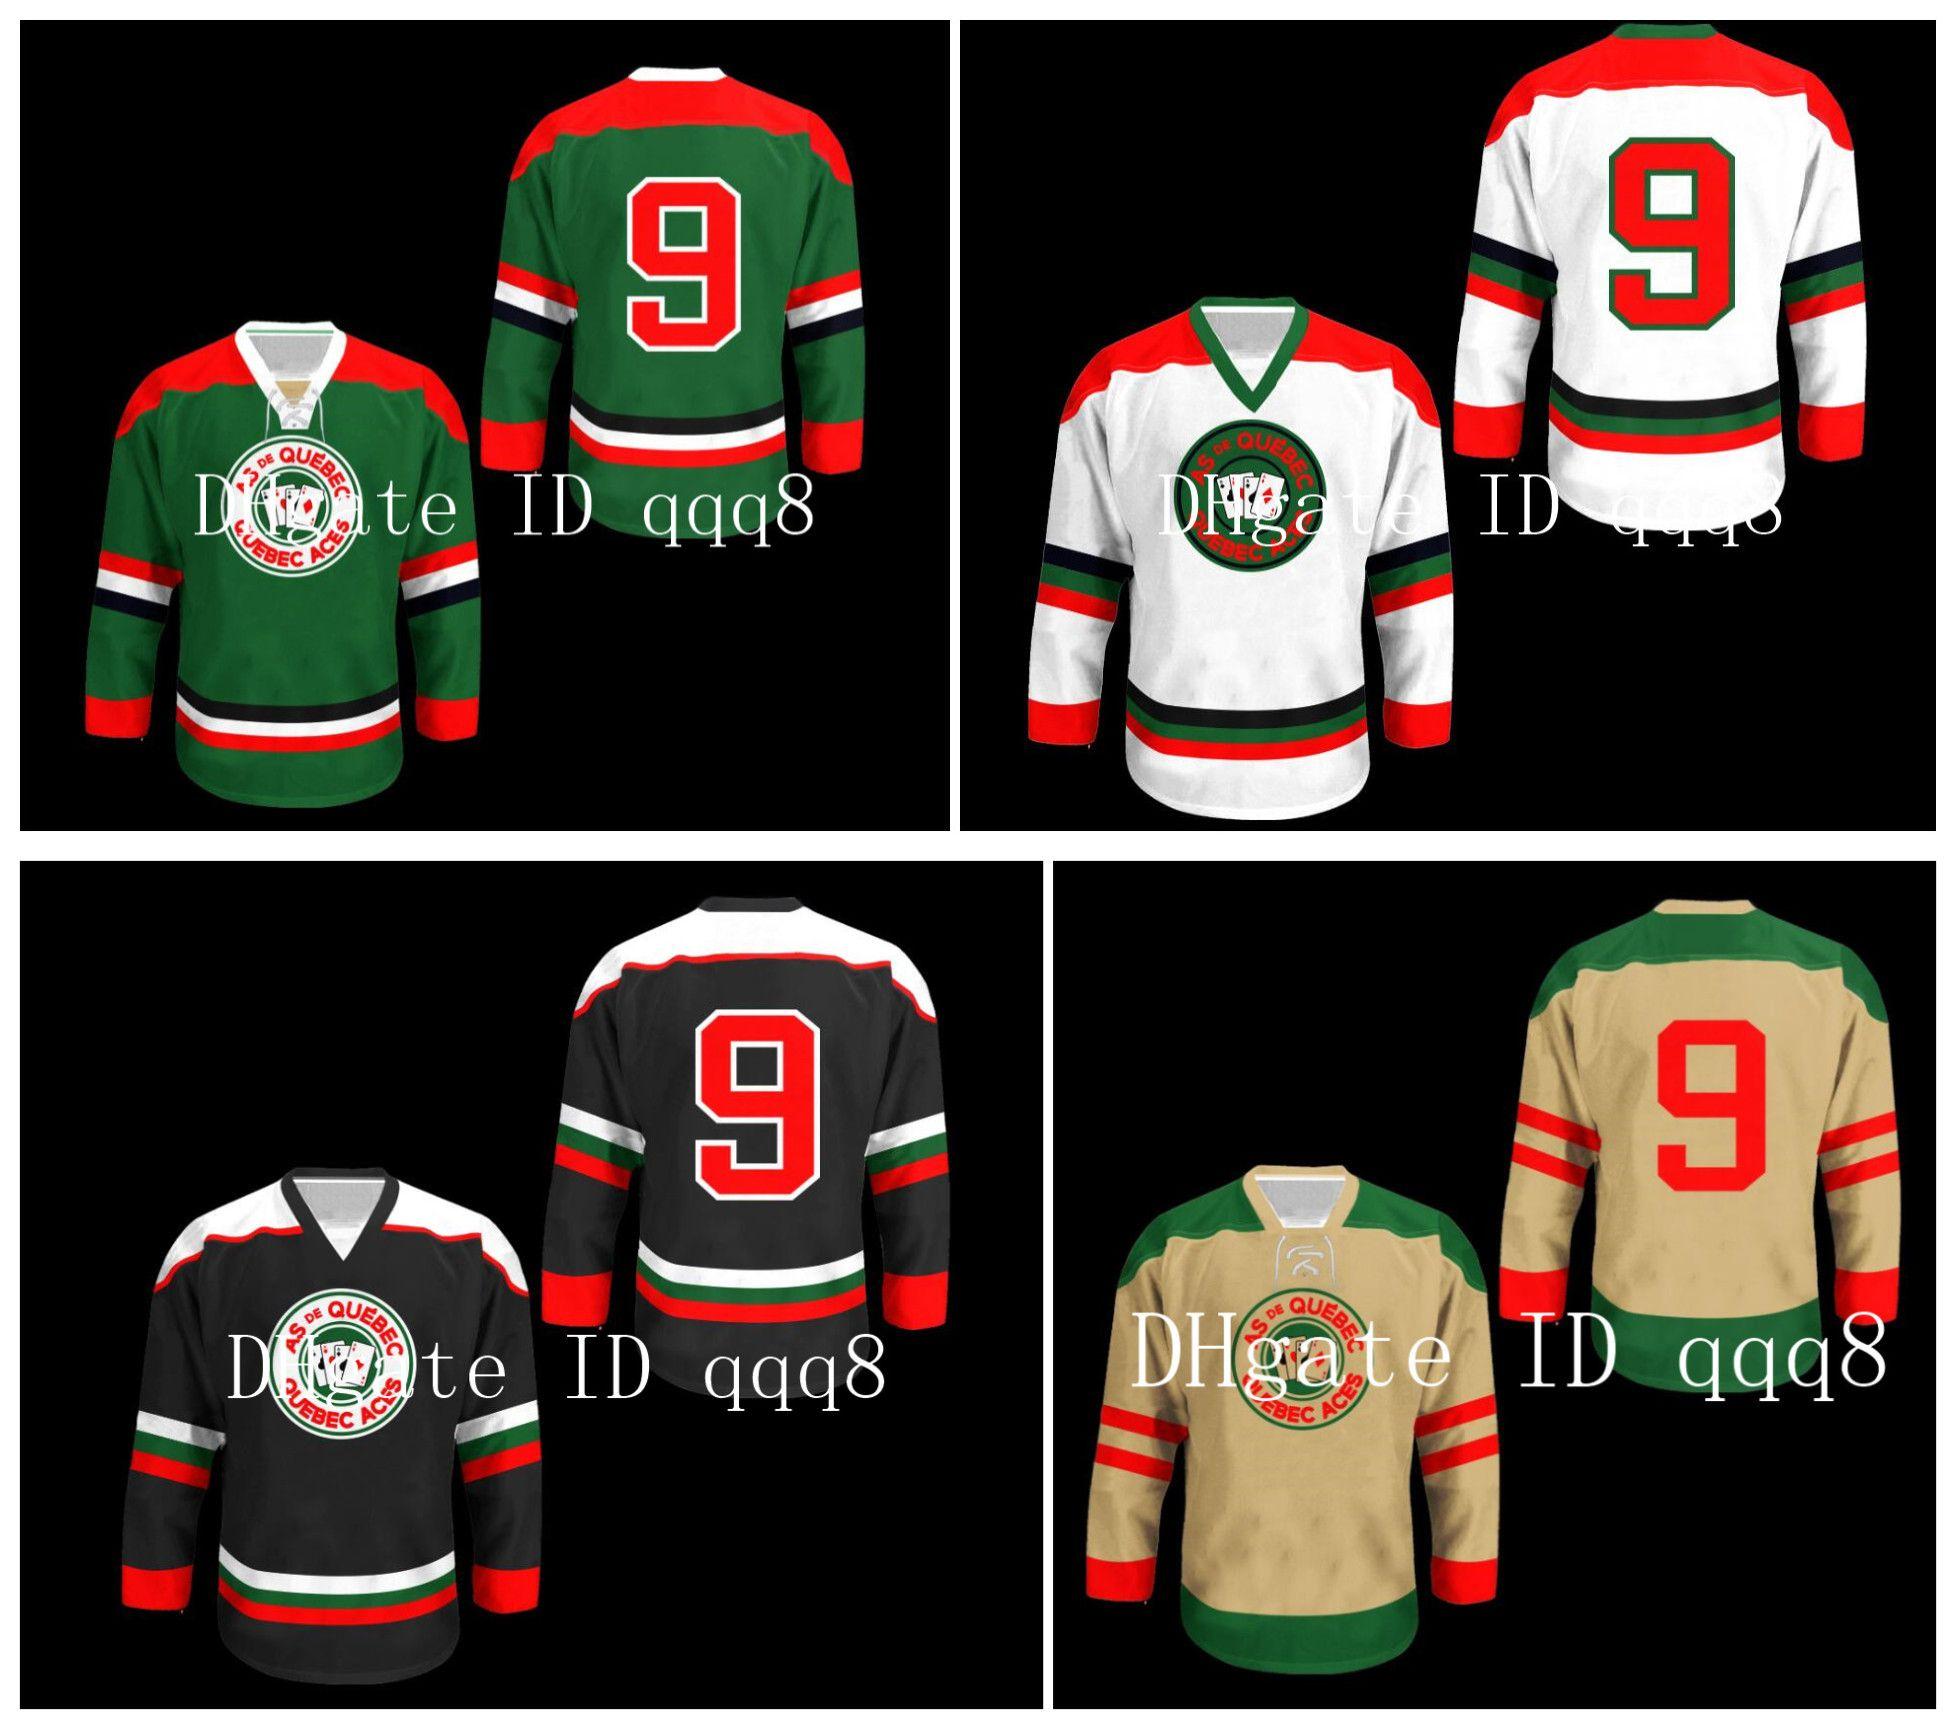 Quebec Aces Jerseys 9 Jean Beliveau 그린 화이트 크림 블랙 사용자 정의 모든 이름 100 % Stitching Custom Hockey Jerseys